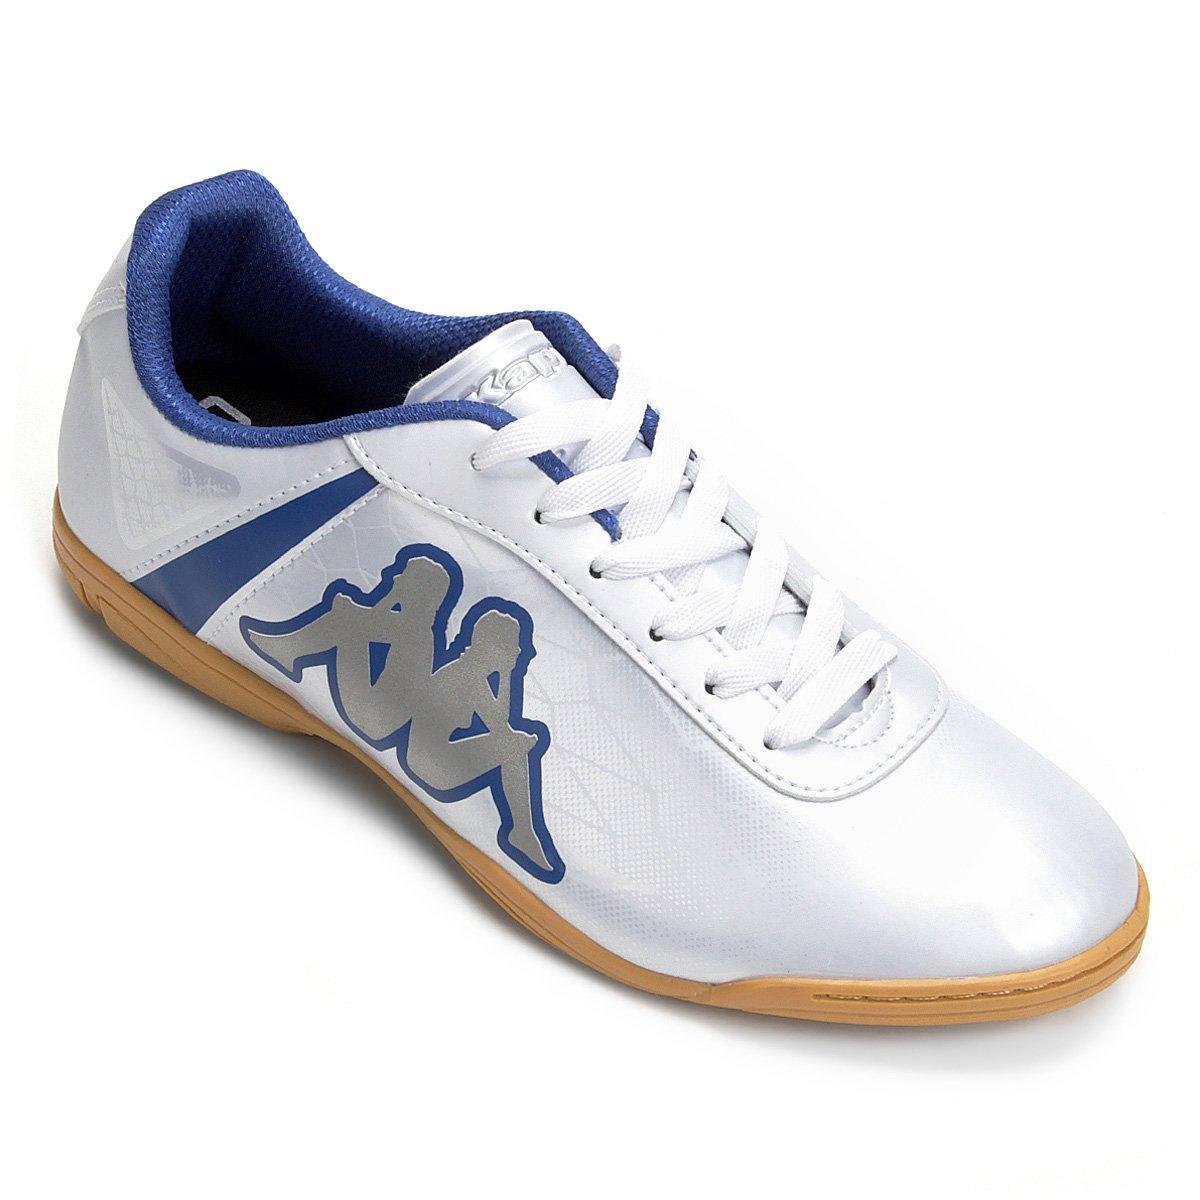 0f3cbd8186 Chuteira Futsal Kappa Torpedo - Branco e Azul - Compre Agora